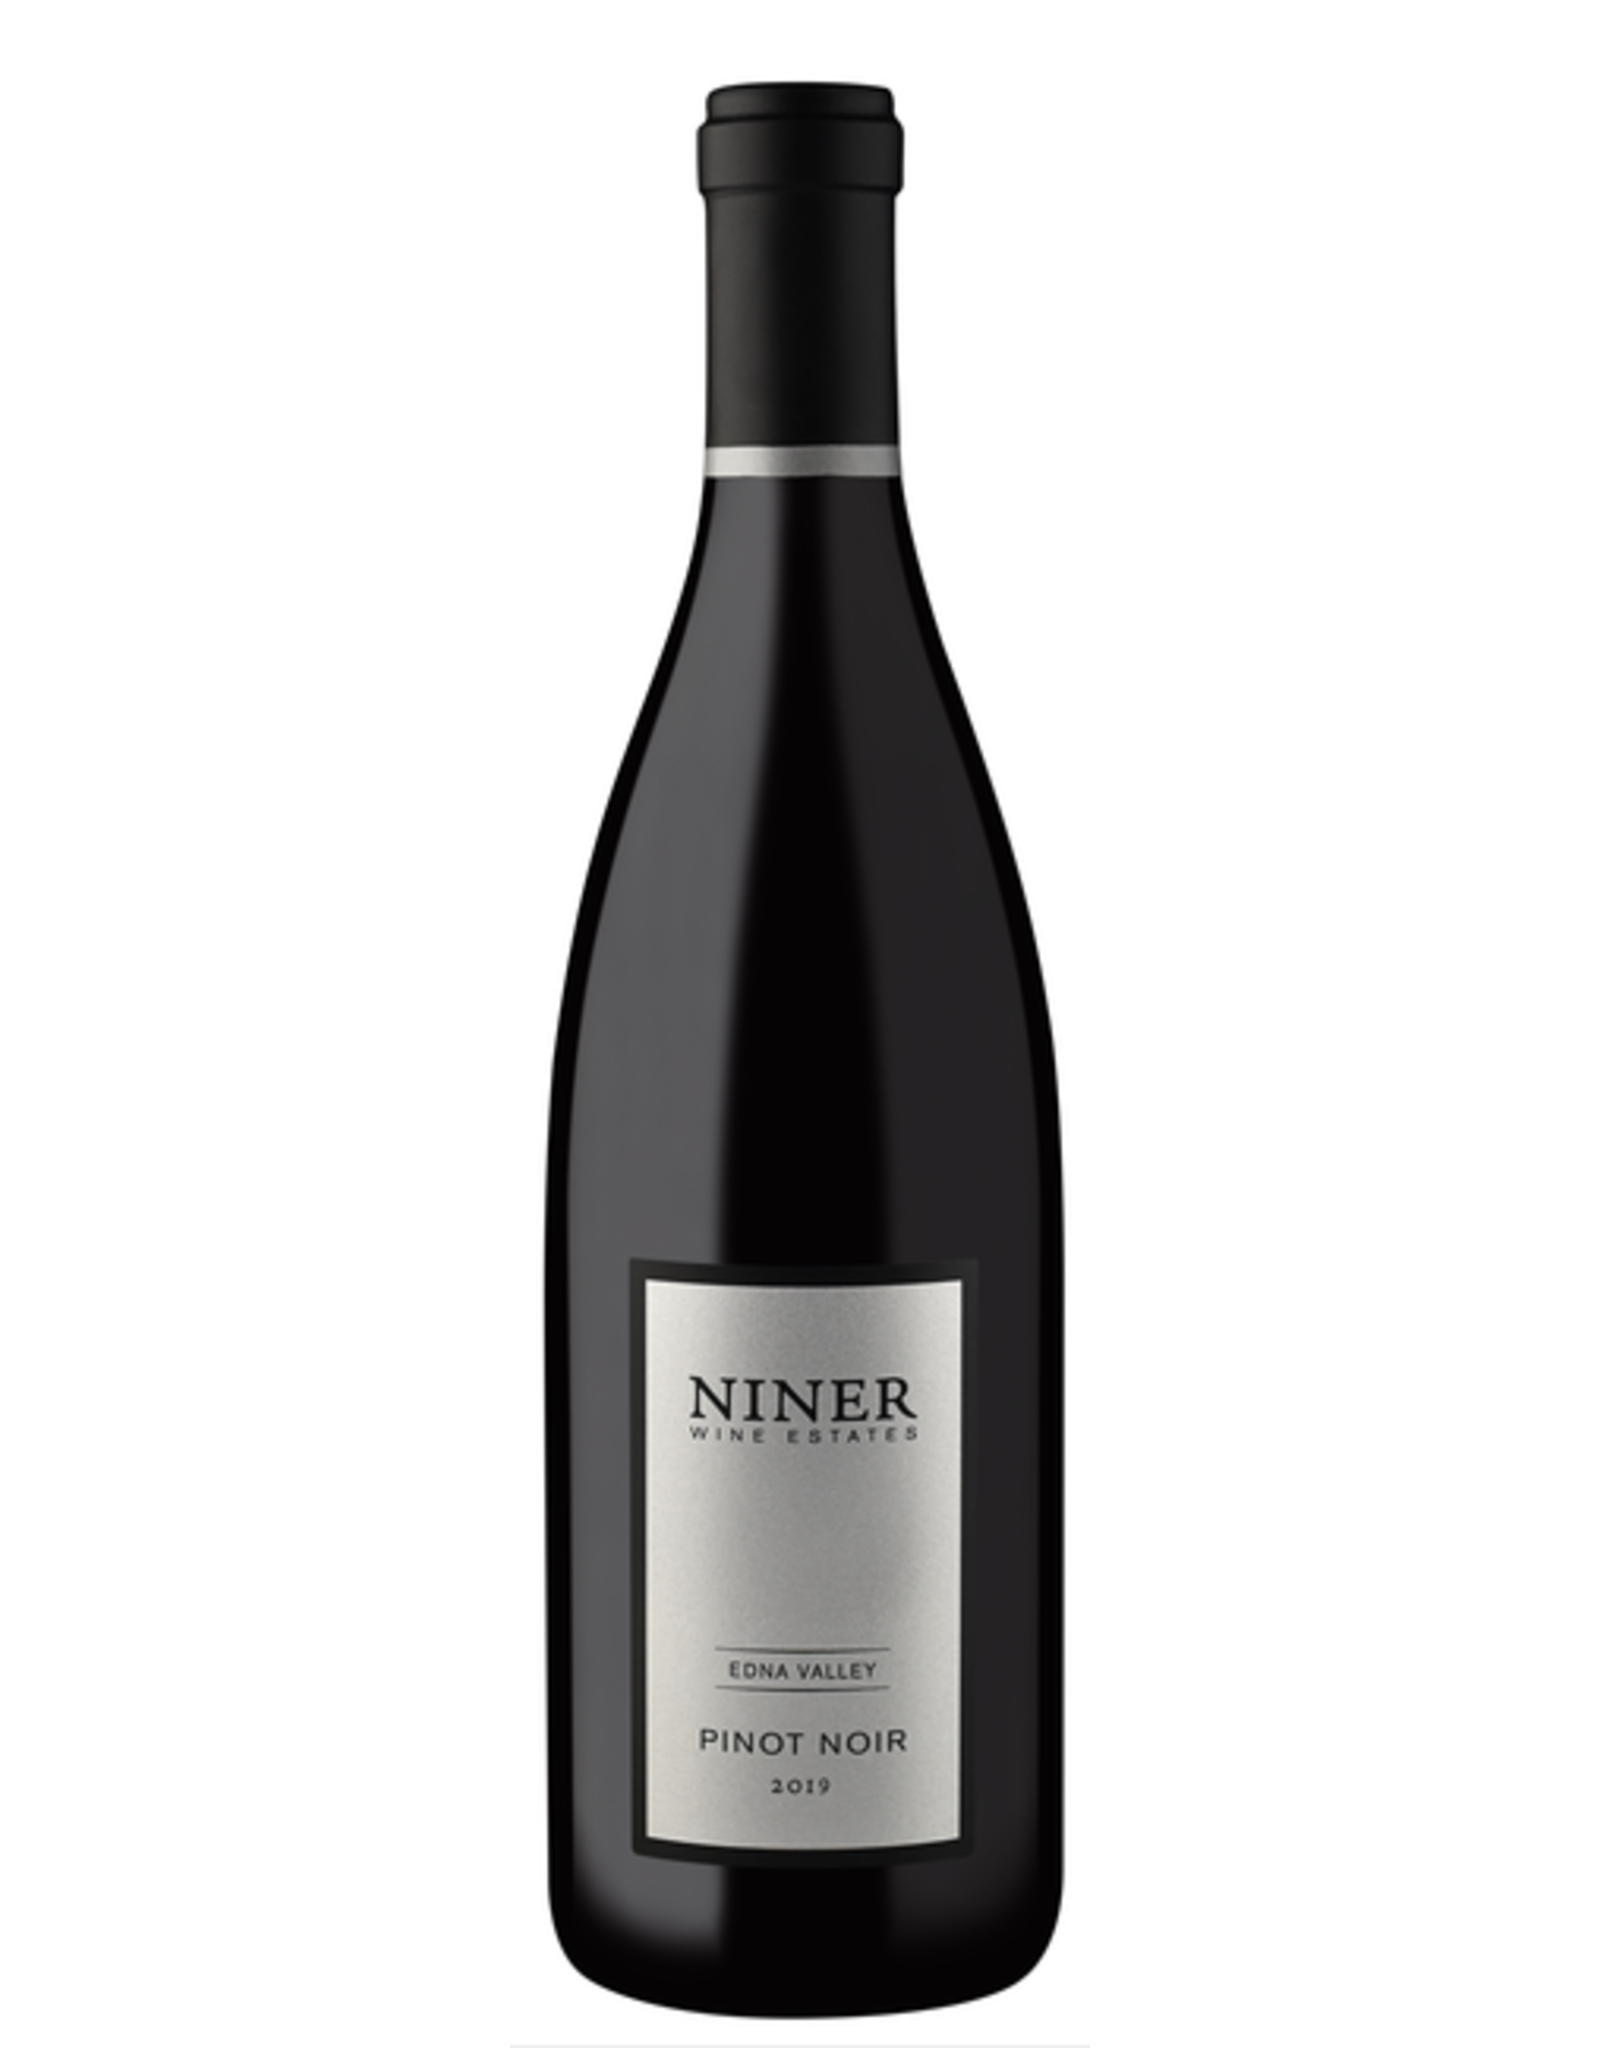 Niner Pinot Noir 2019